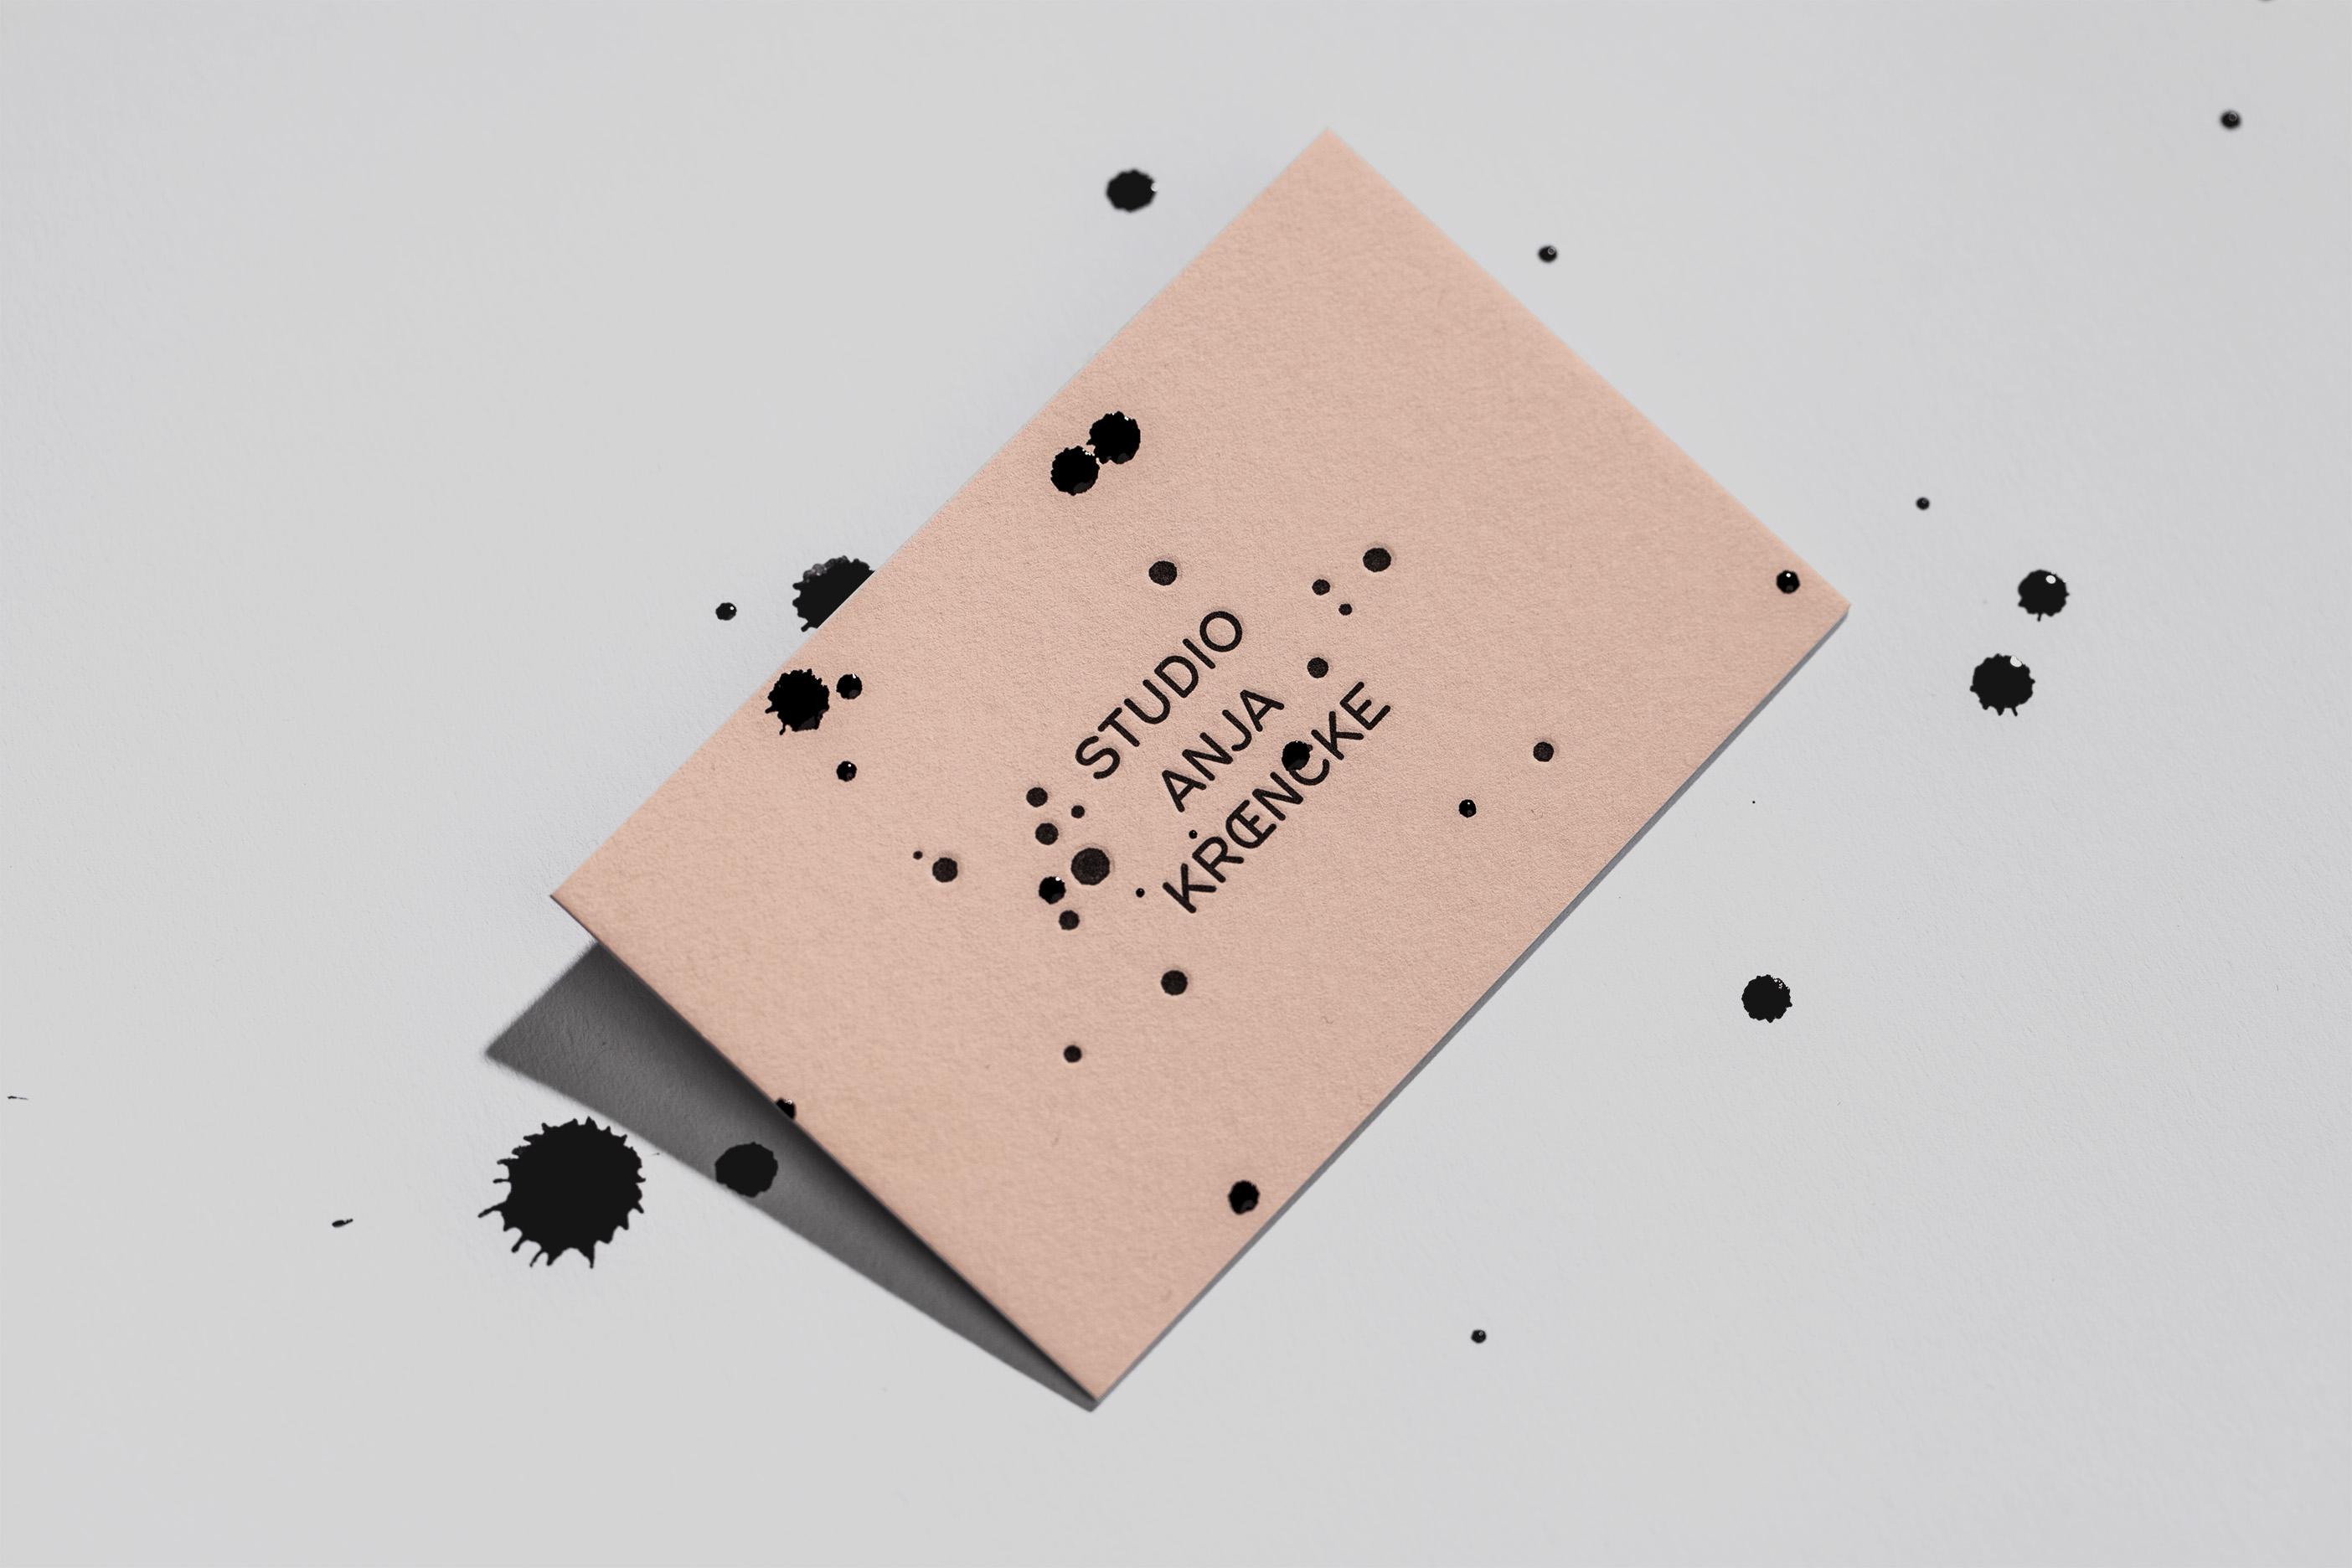 studio-anja-kroencke-identity-bureau-rabensteiner-04